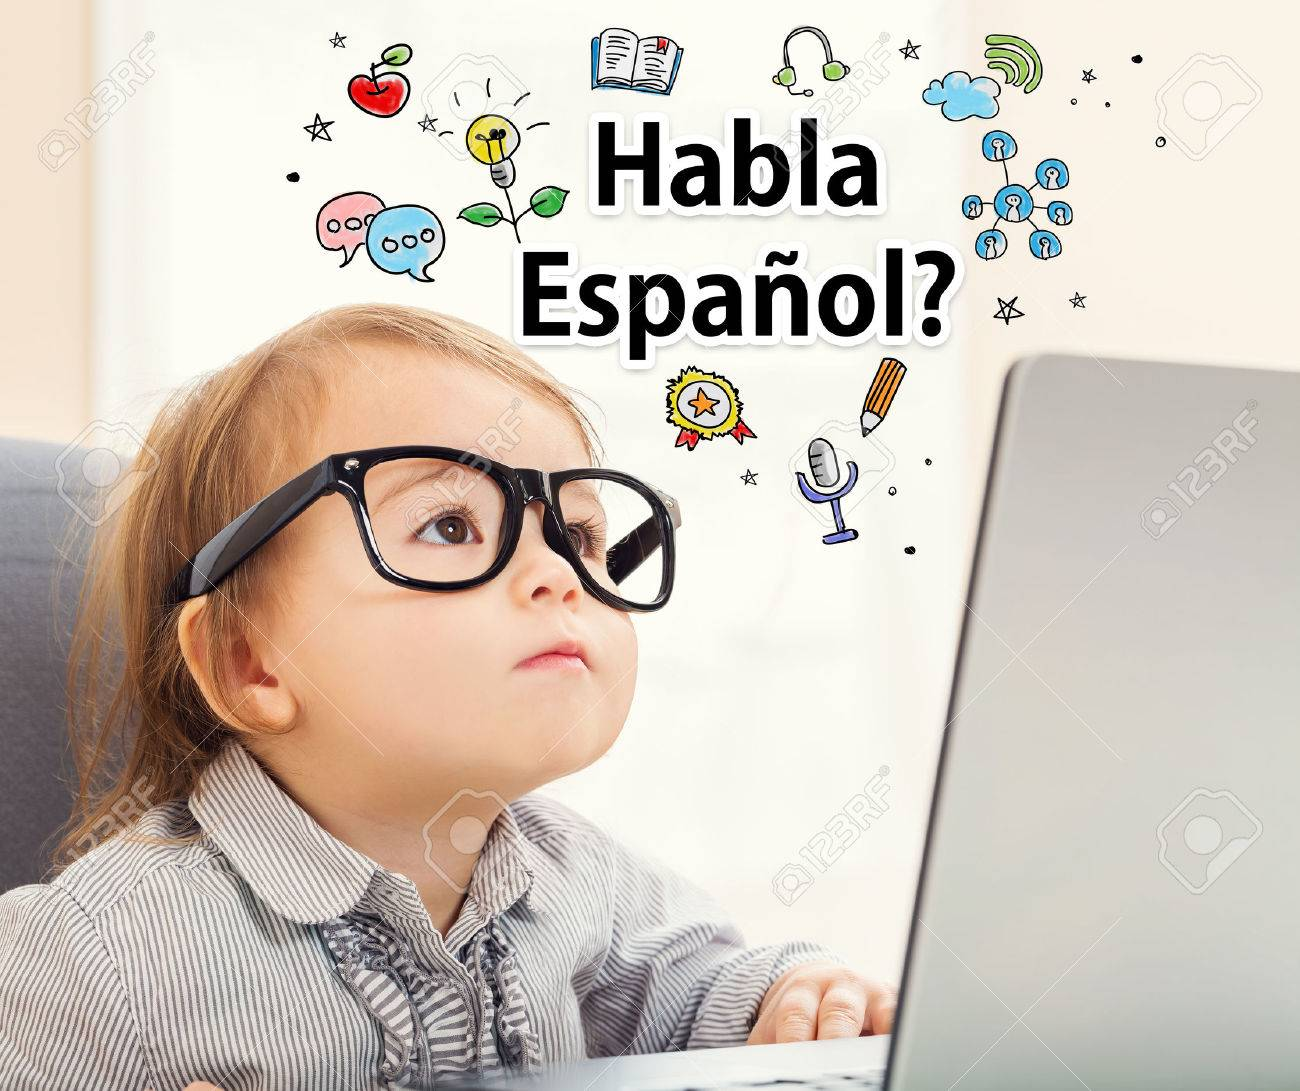 Habla Espanol (Do you speak Spanish) texts with toddler girl using her laptop Standard-Bild - 59198844